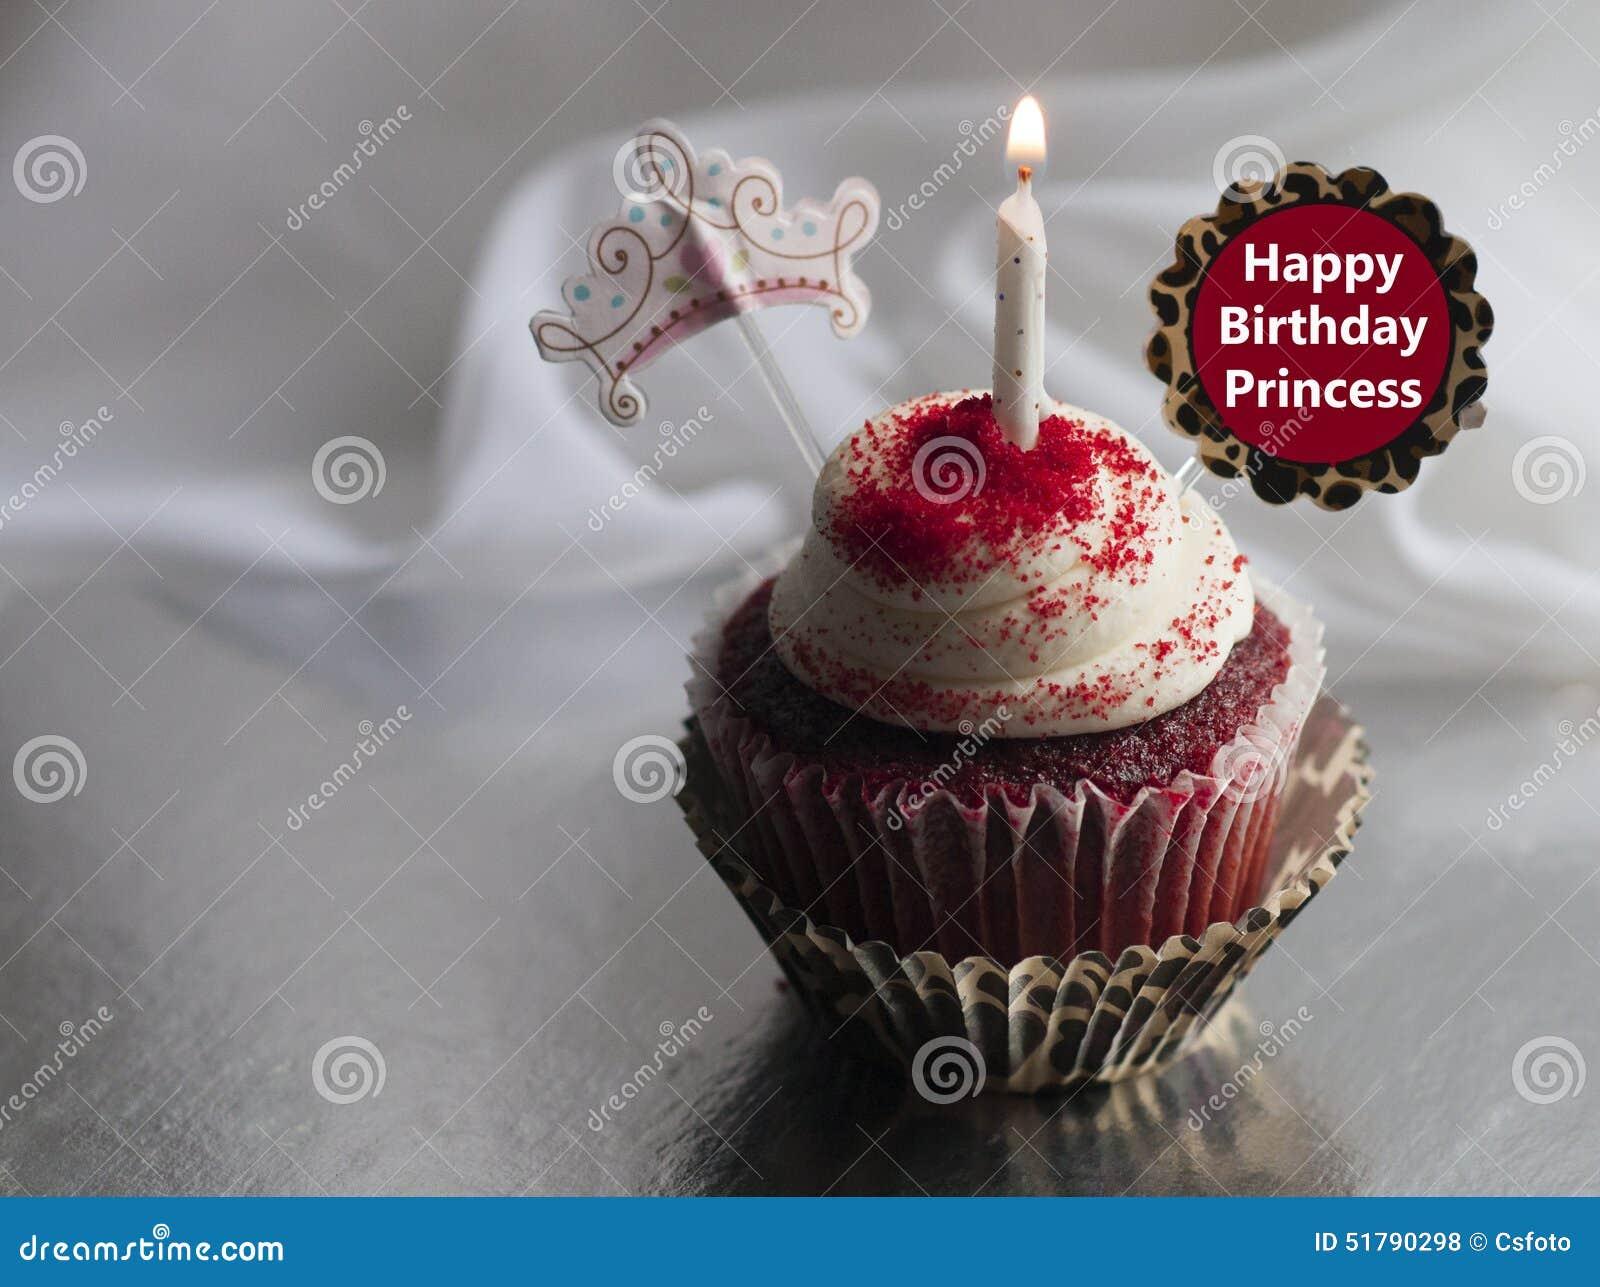 Manisha Birthday Cake Images : Happy Birthday Manisha Di Wallpaper - Best Image WebProXP.Com